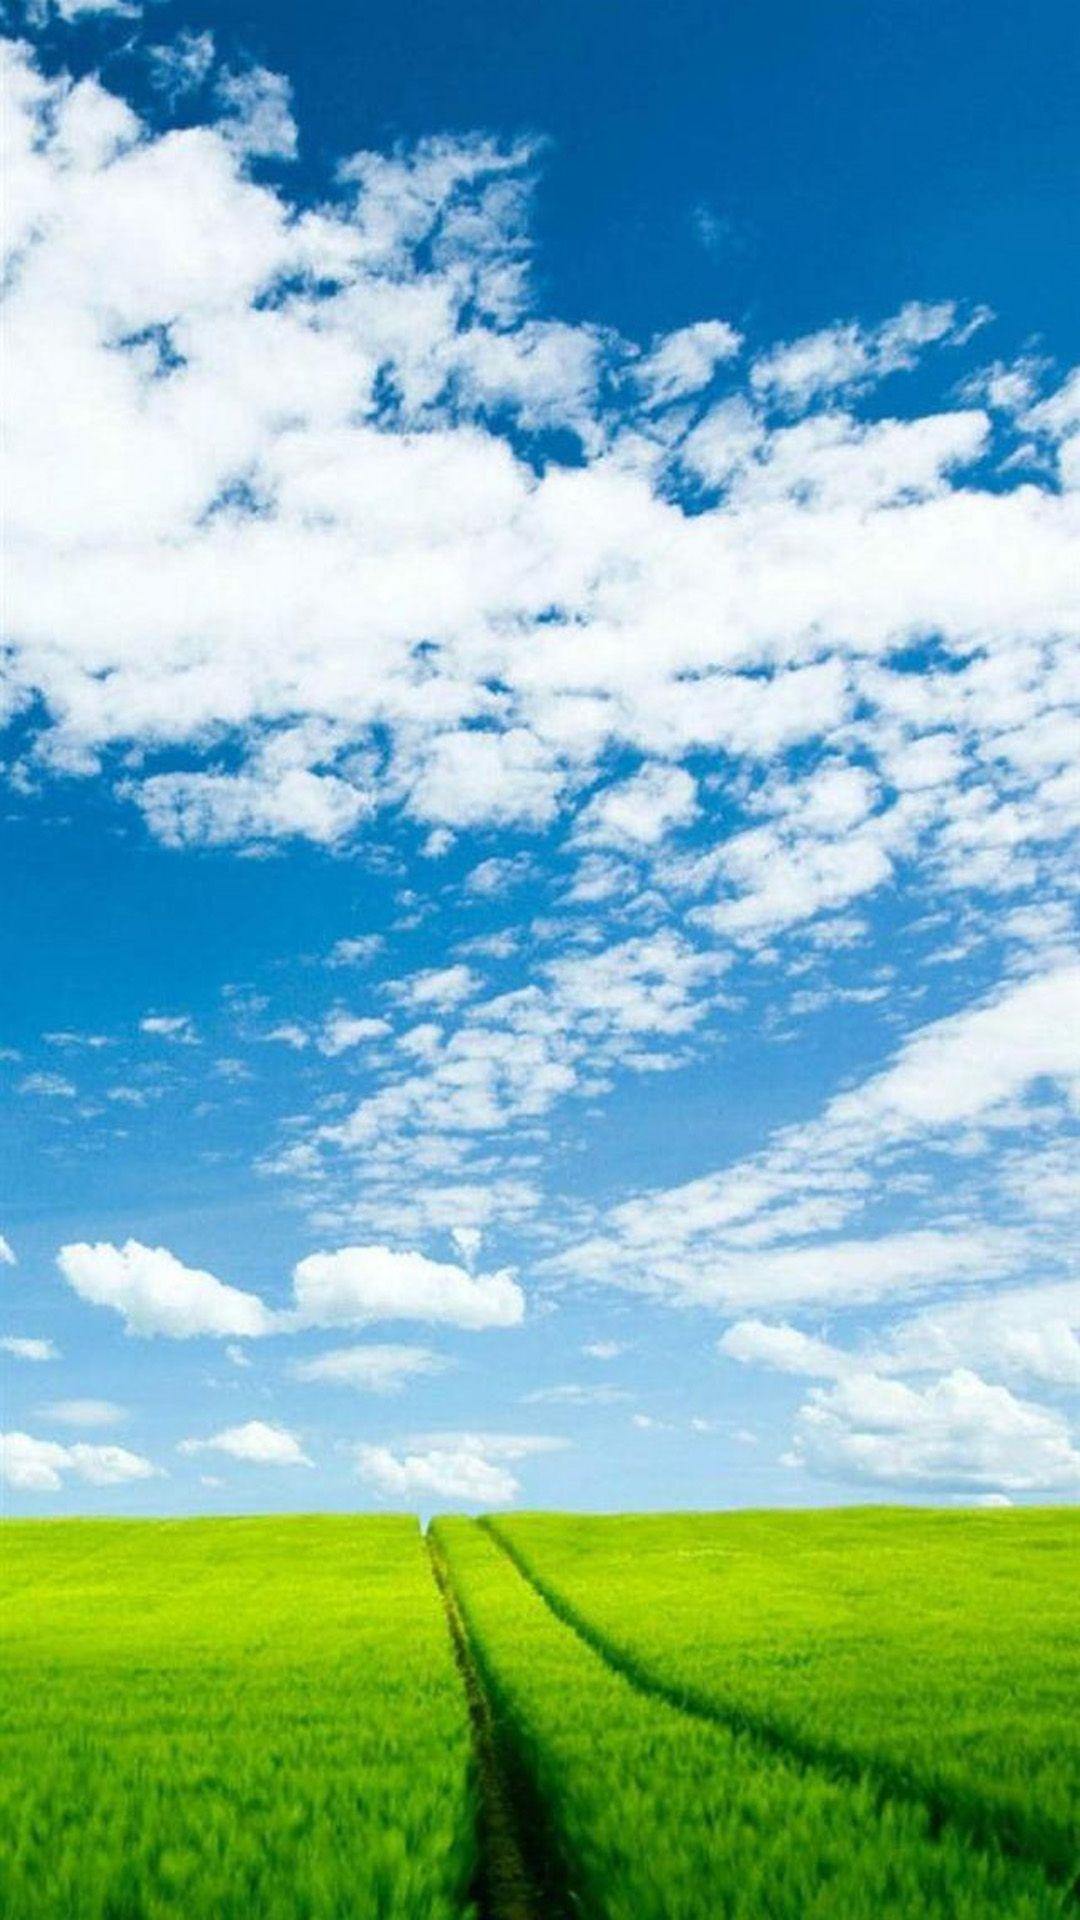 Nature Sunshine Green Corp Field Cloudy Sky iPhone 8